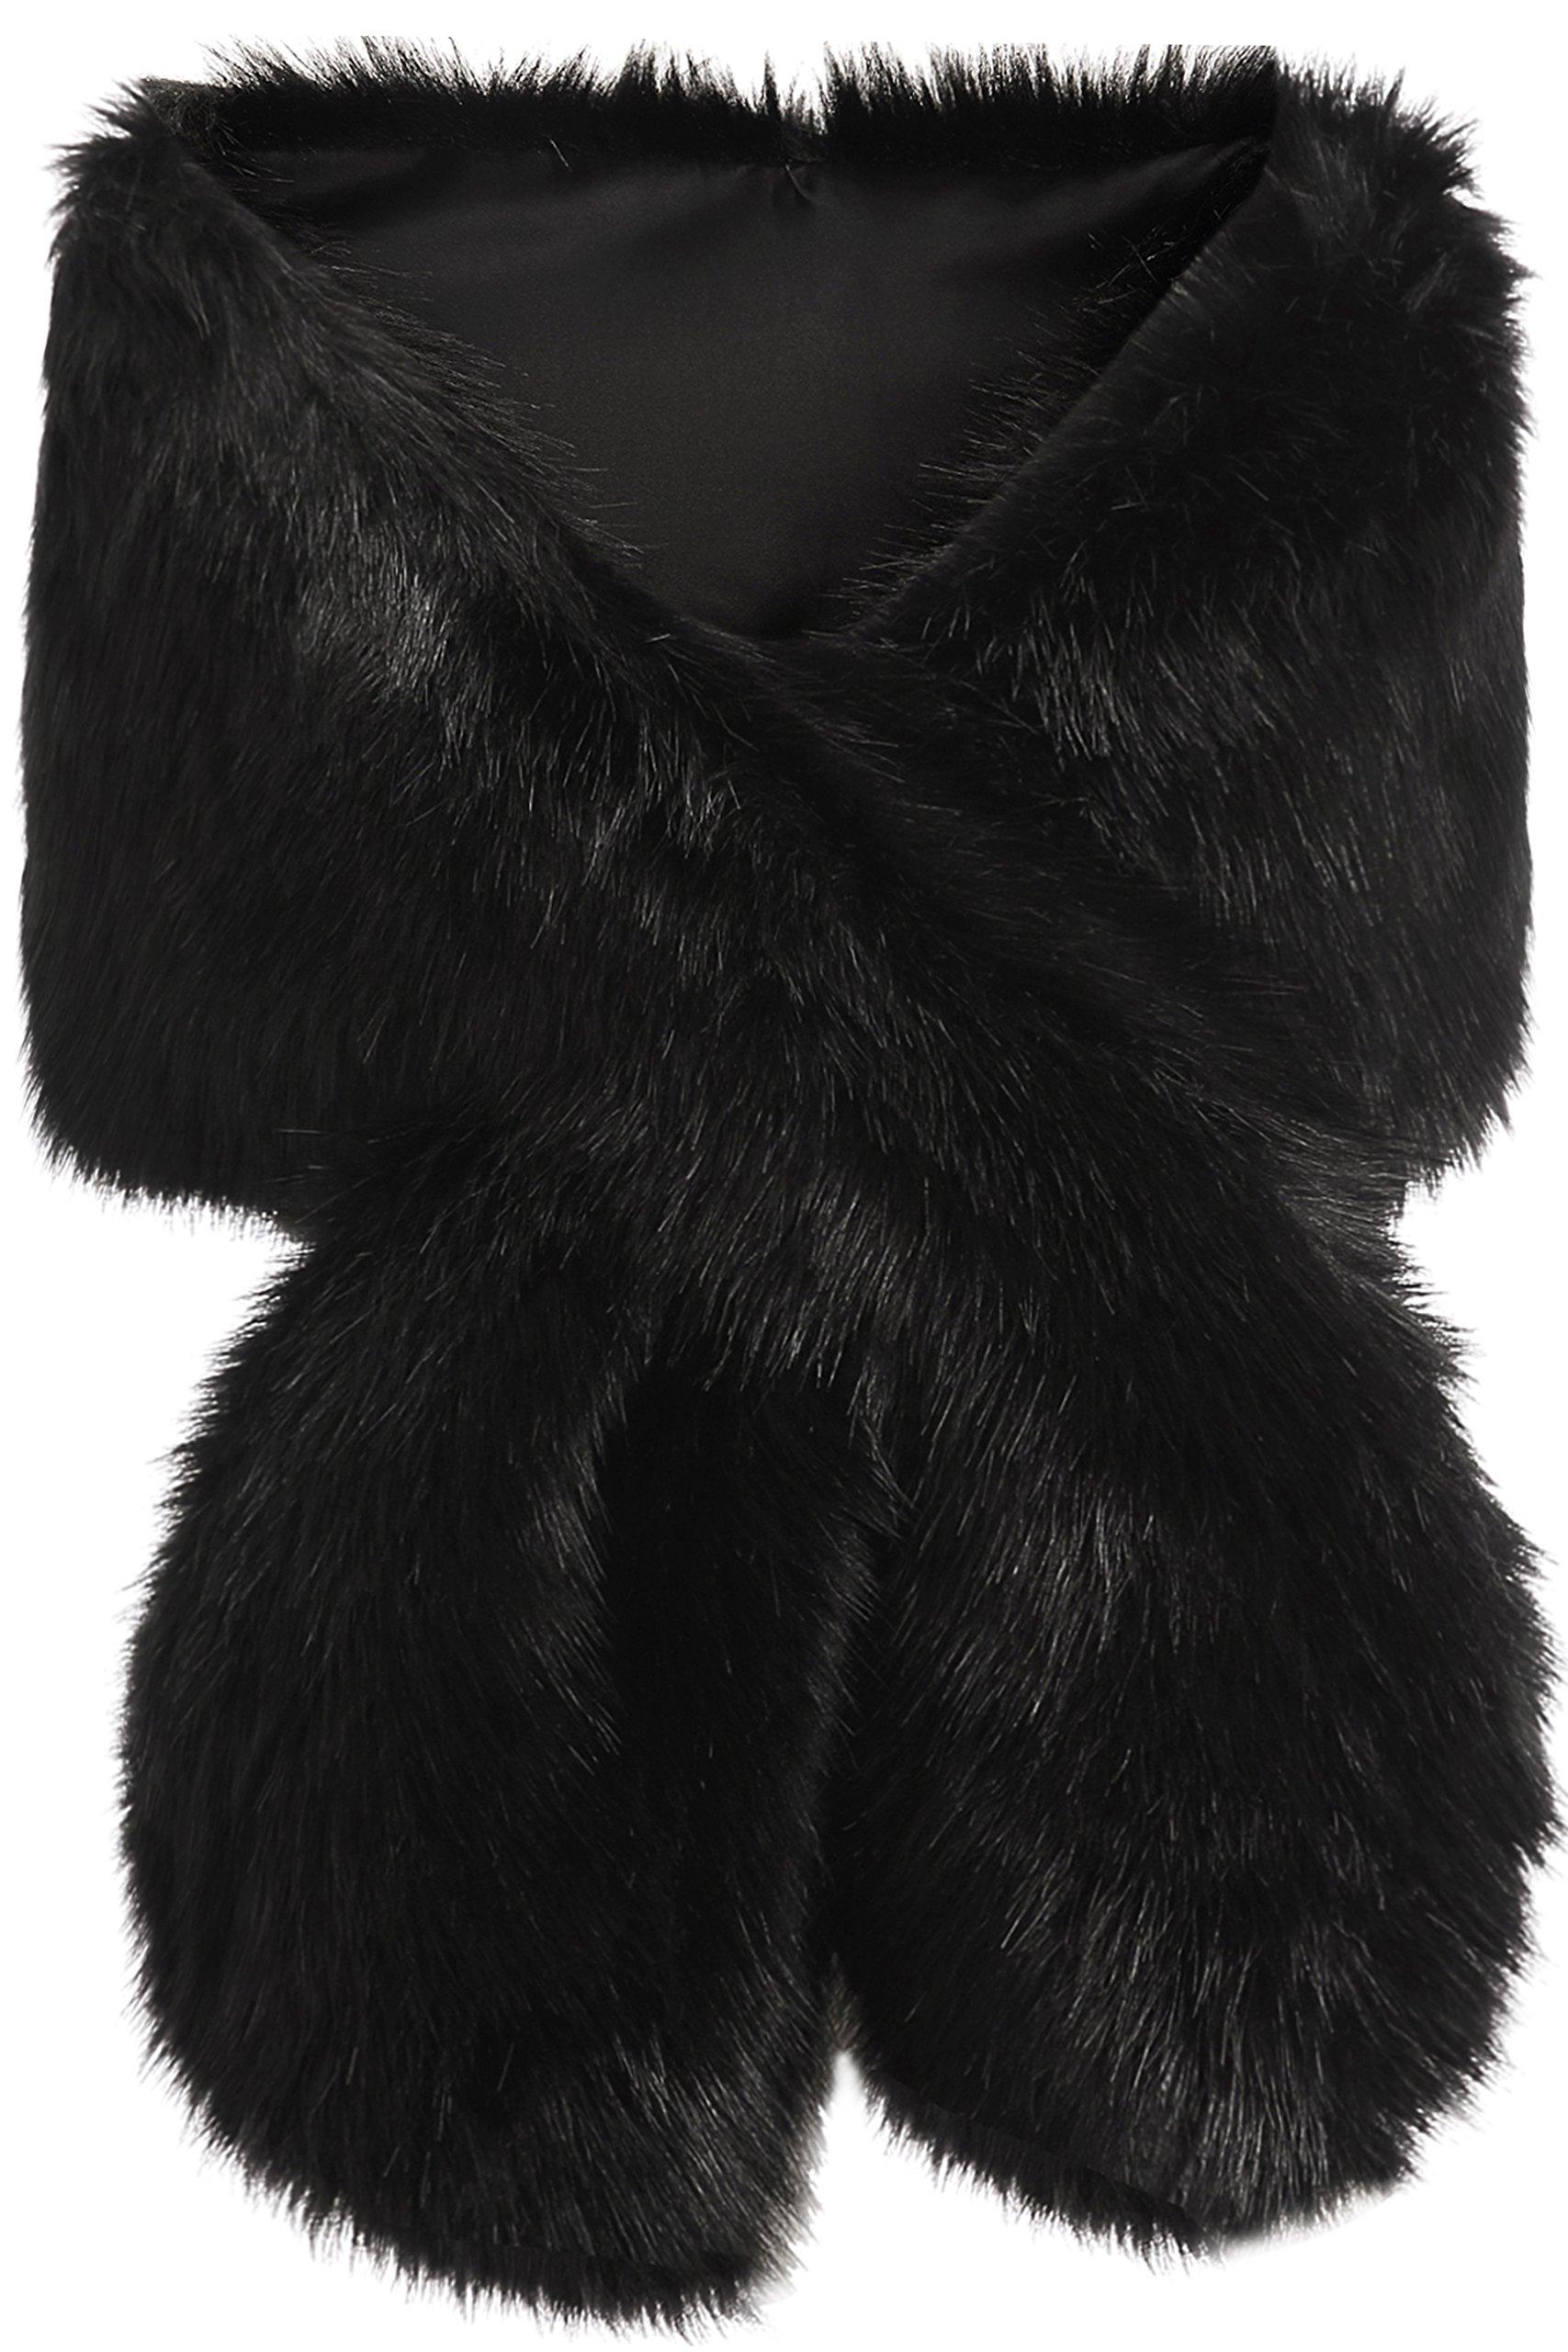 BABEYOND Womens Faux Fur Collar Shawl Faux Fur Scarf Wrap Evening Cape for Winter Coat 47.2'' (Large-Black)